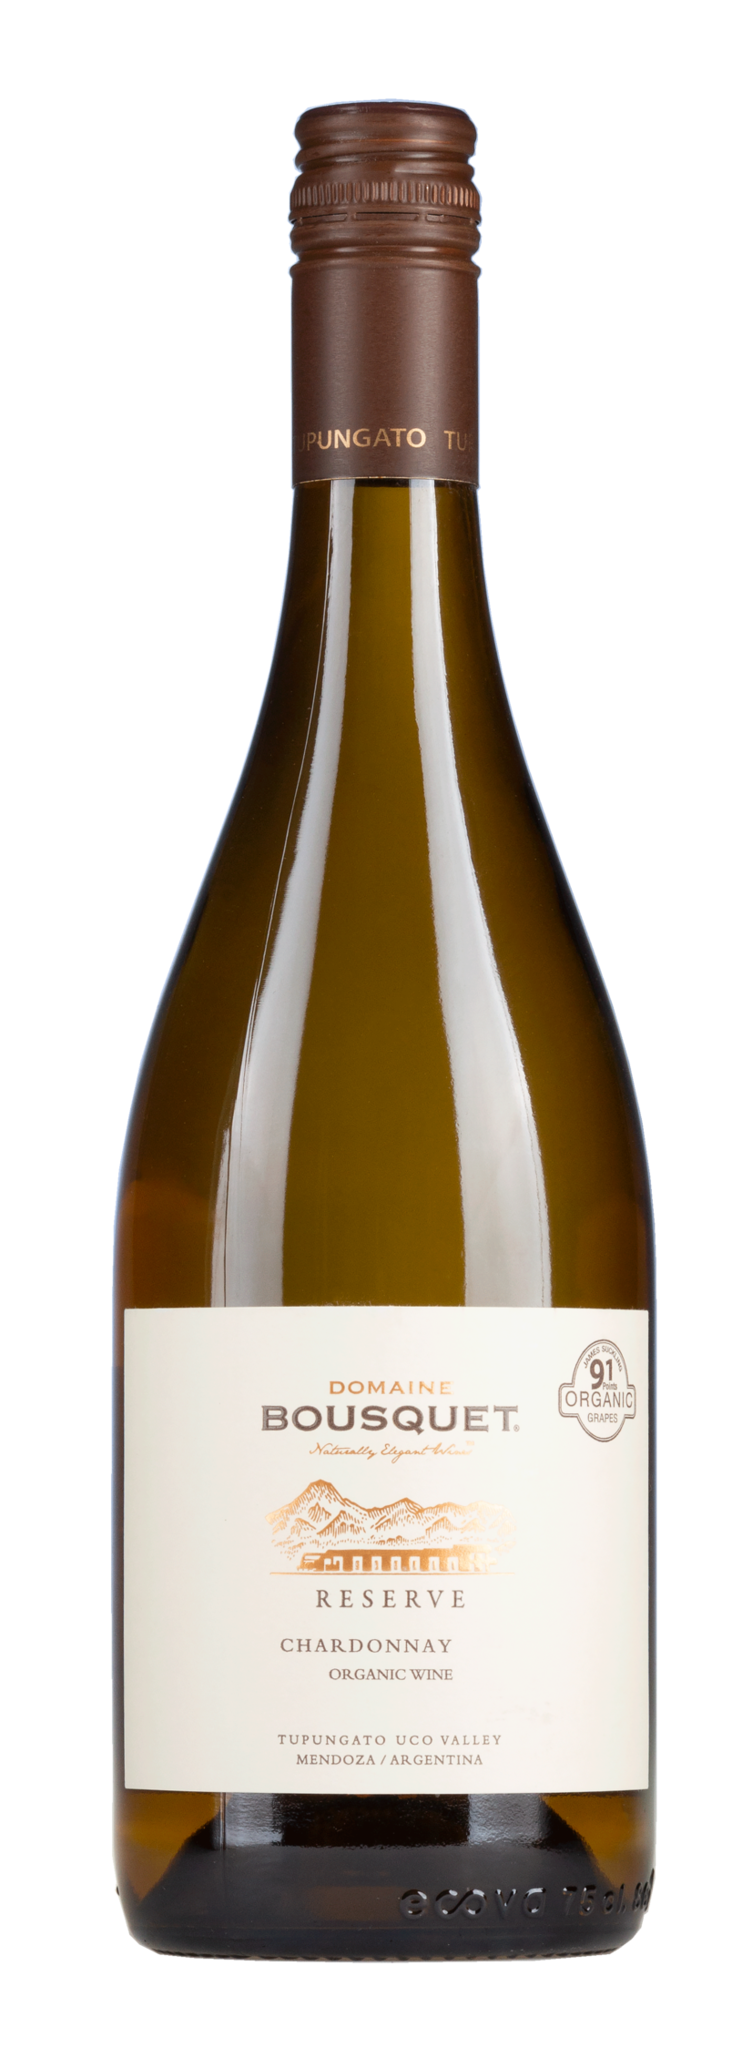 Bousquet, Domaine - Argentinien 2018 Chardonnay Reserve, Dom. Bousquet Biowein